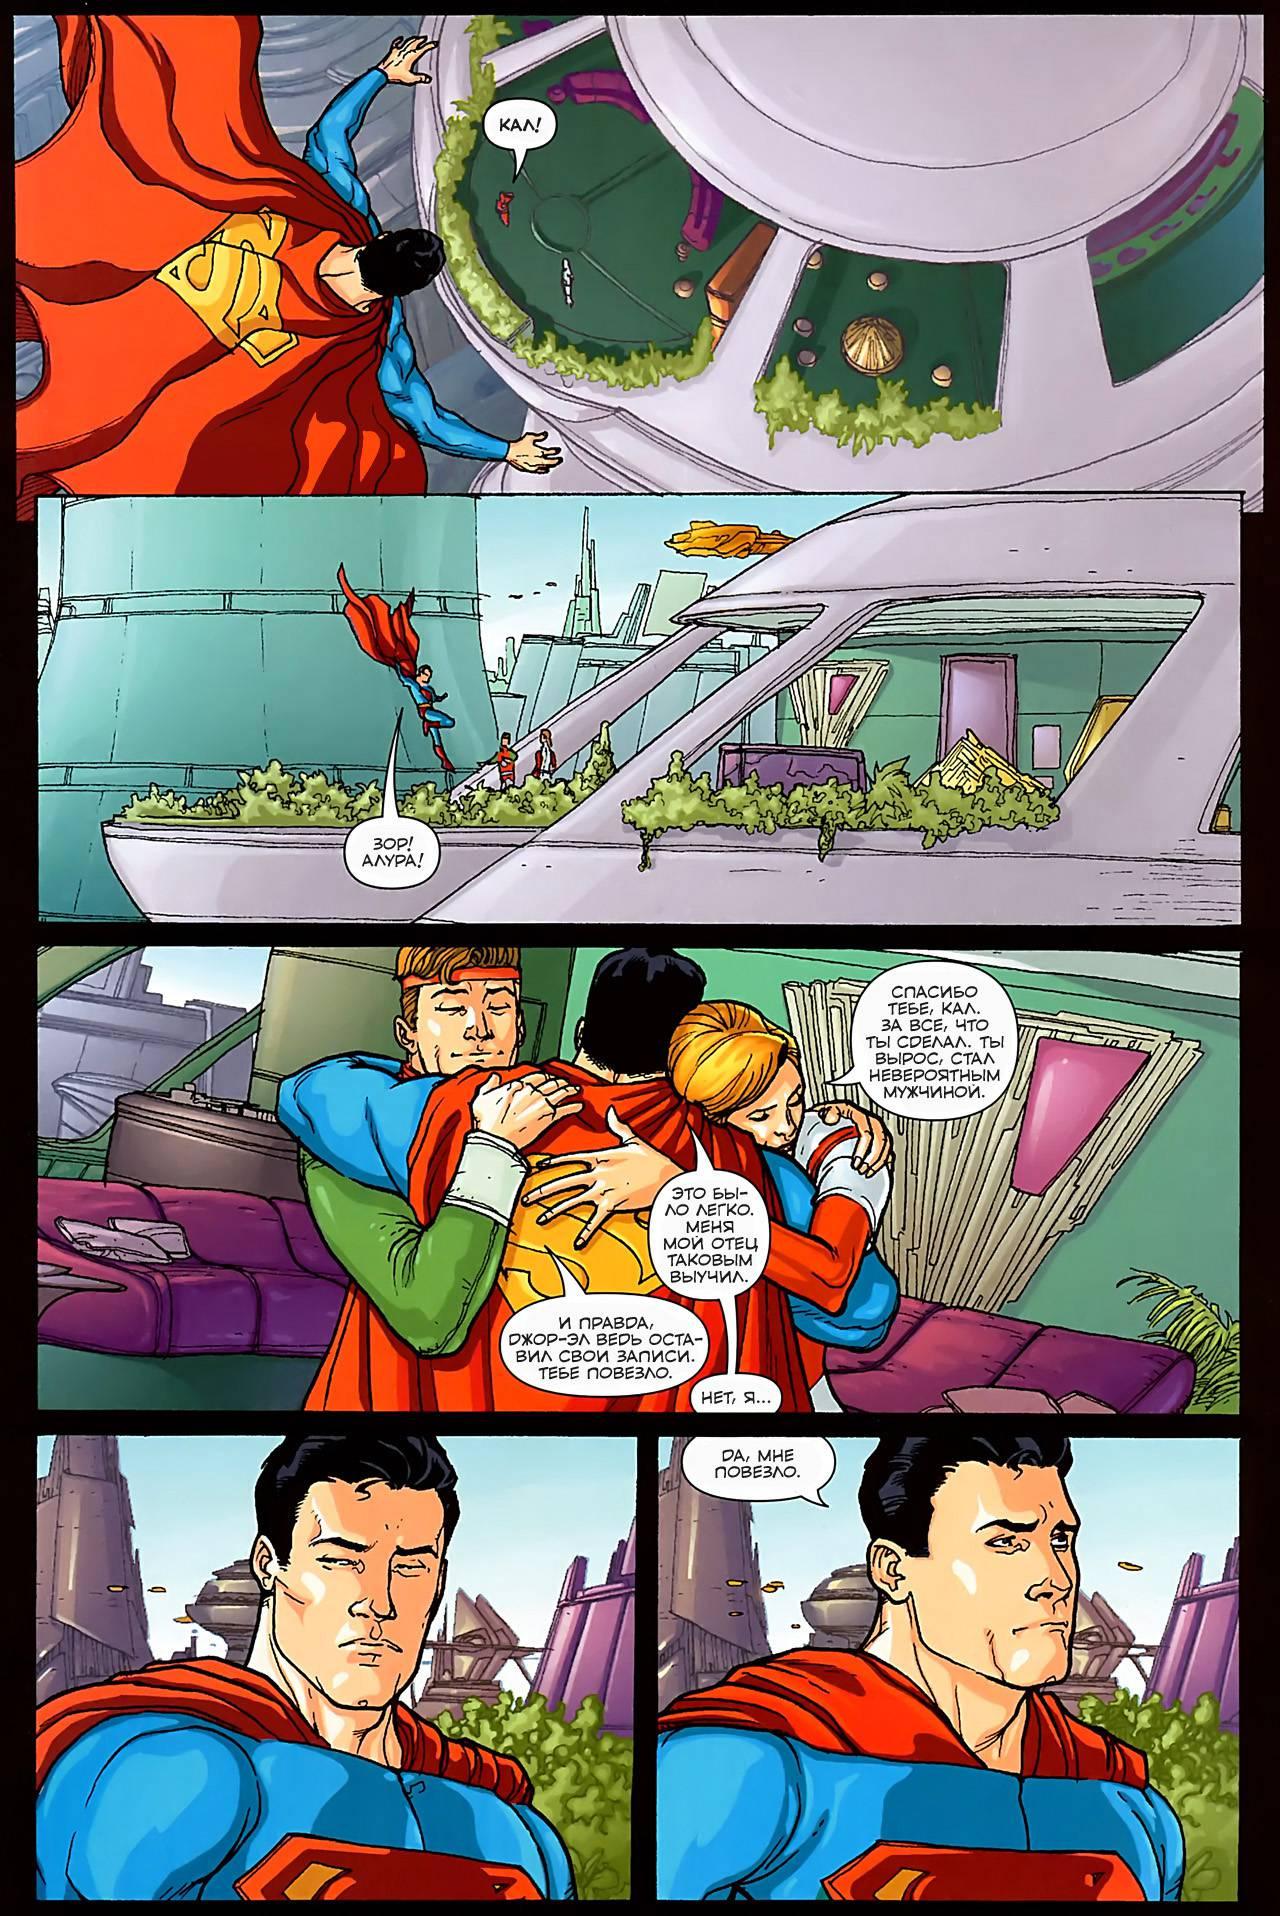 linkkaraelementresearchpaper krypton 1